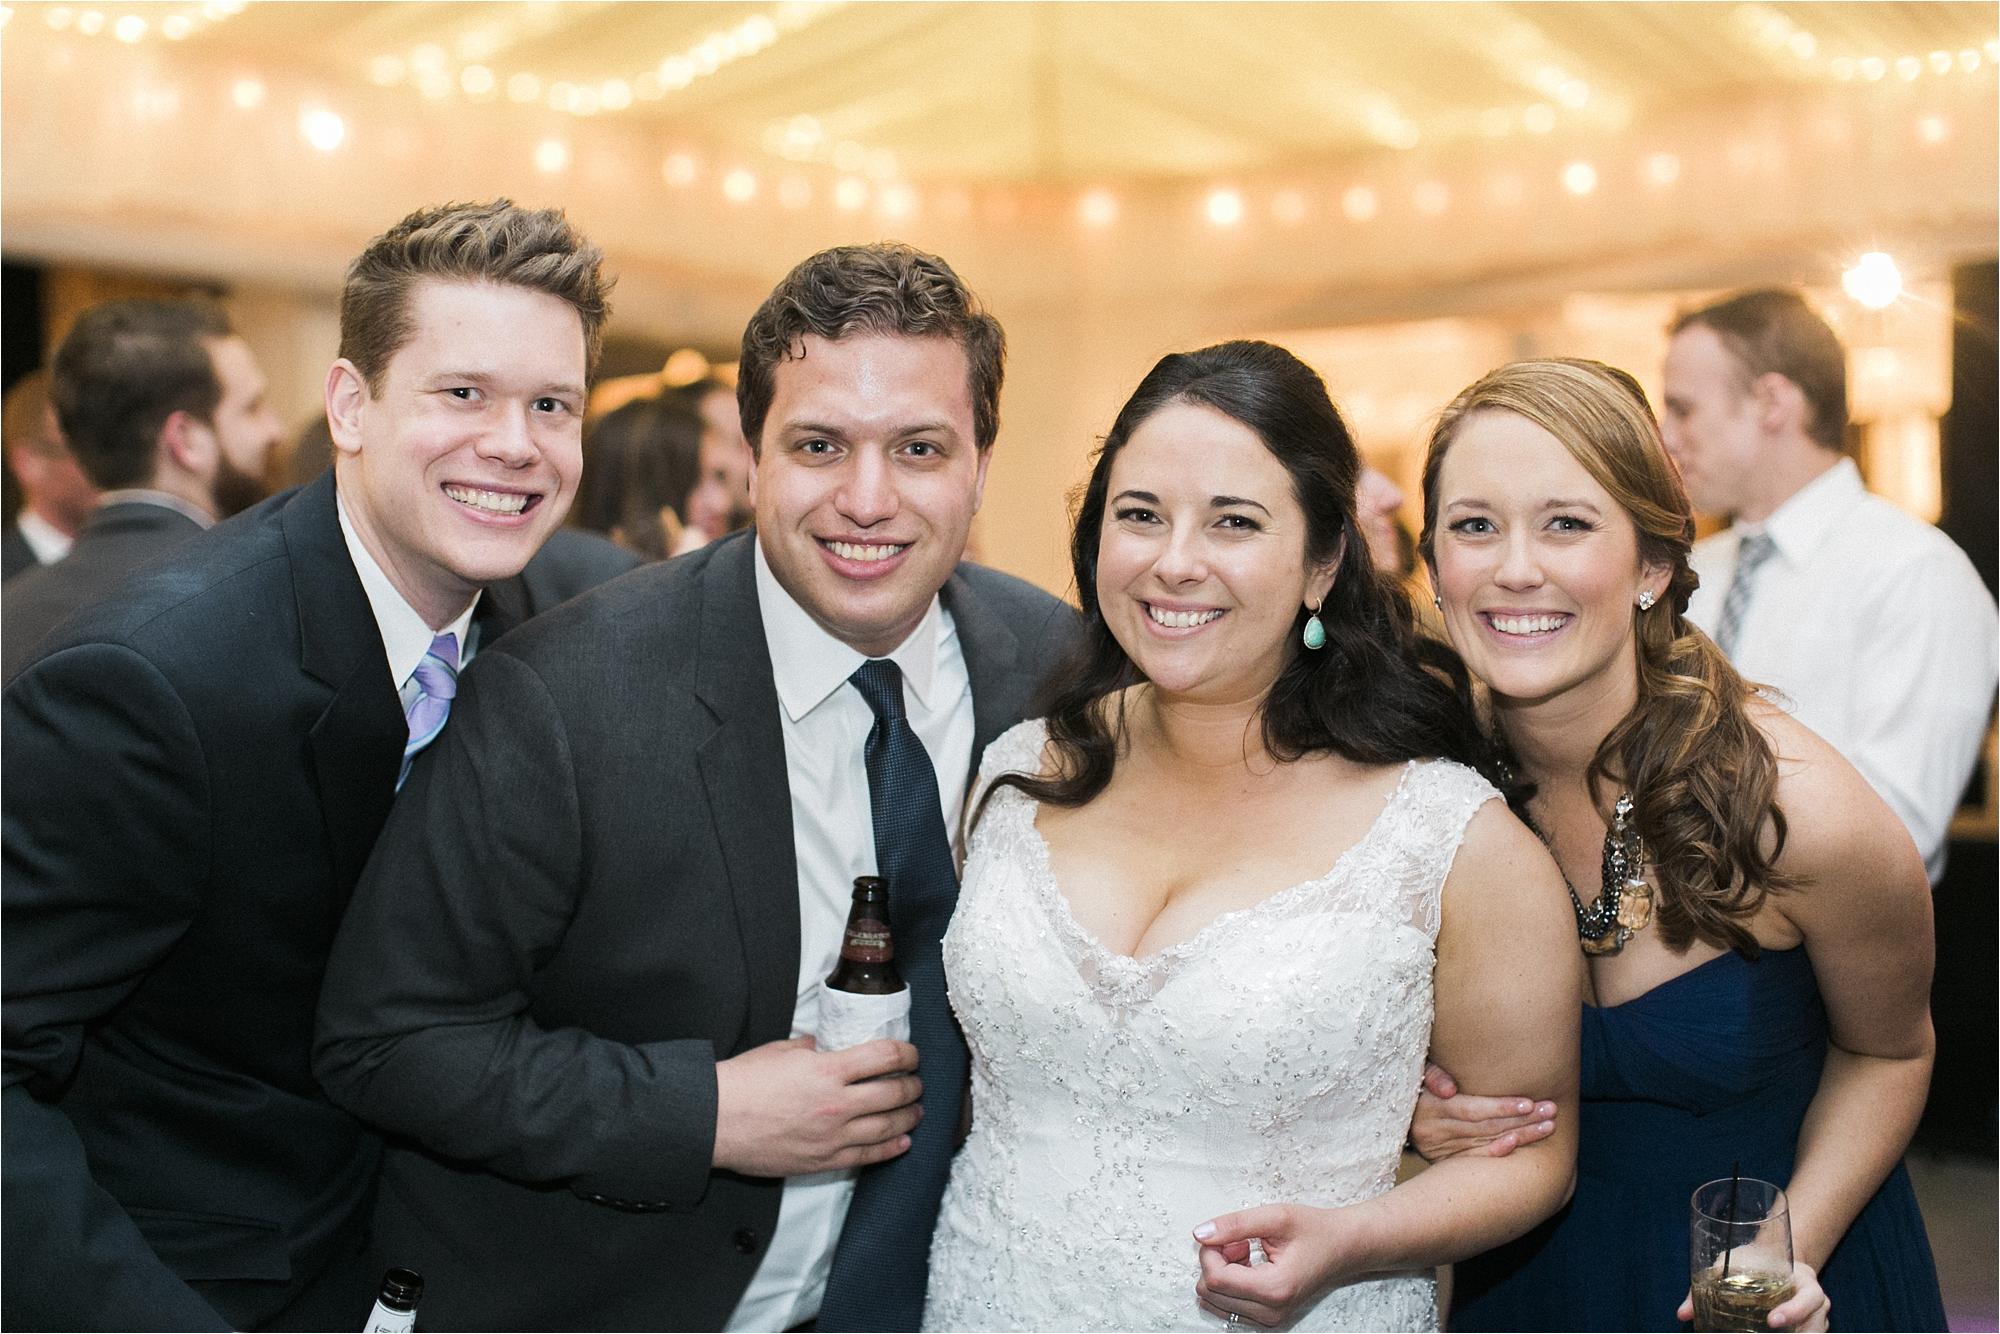 tom-jill-baltimore-maryland-industrial-elegant-wedding-061.JPG